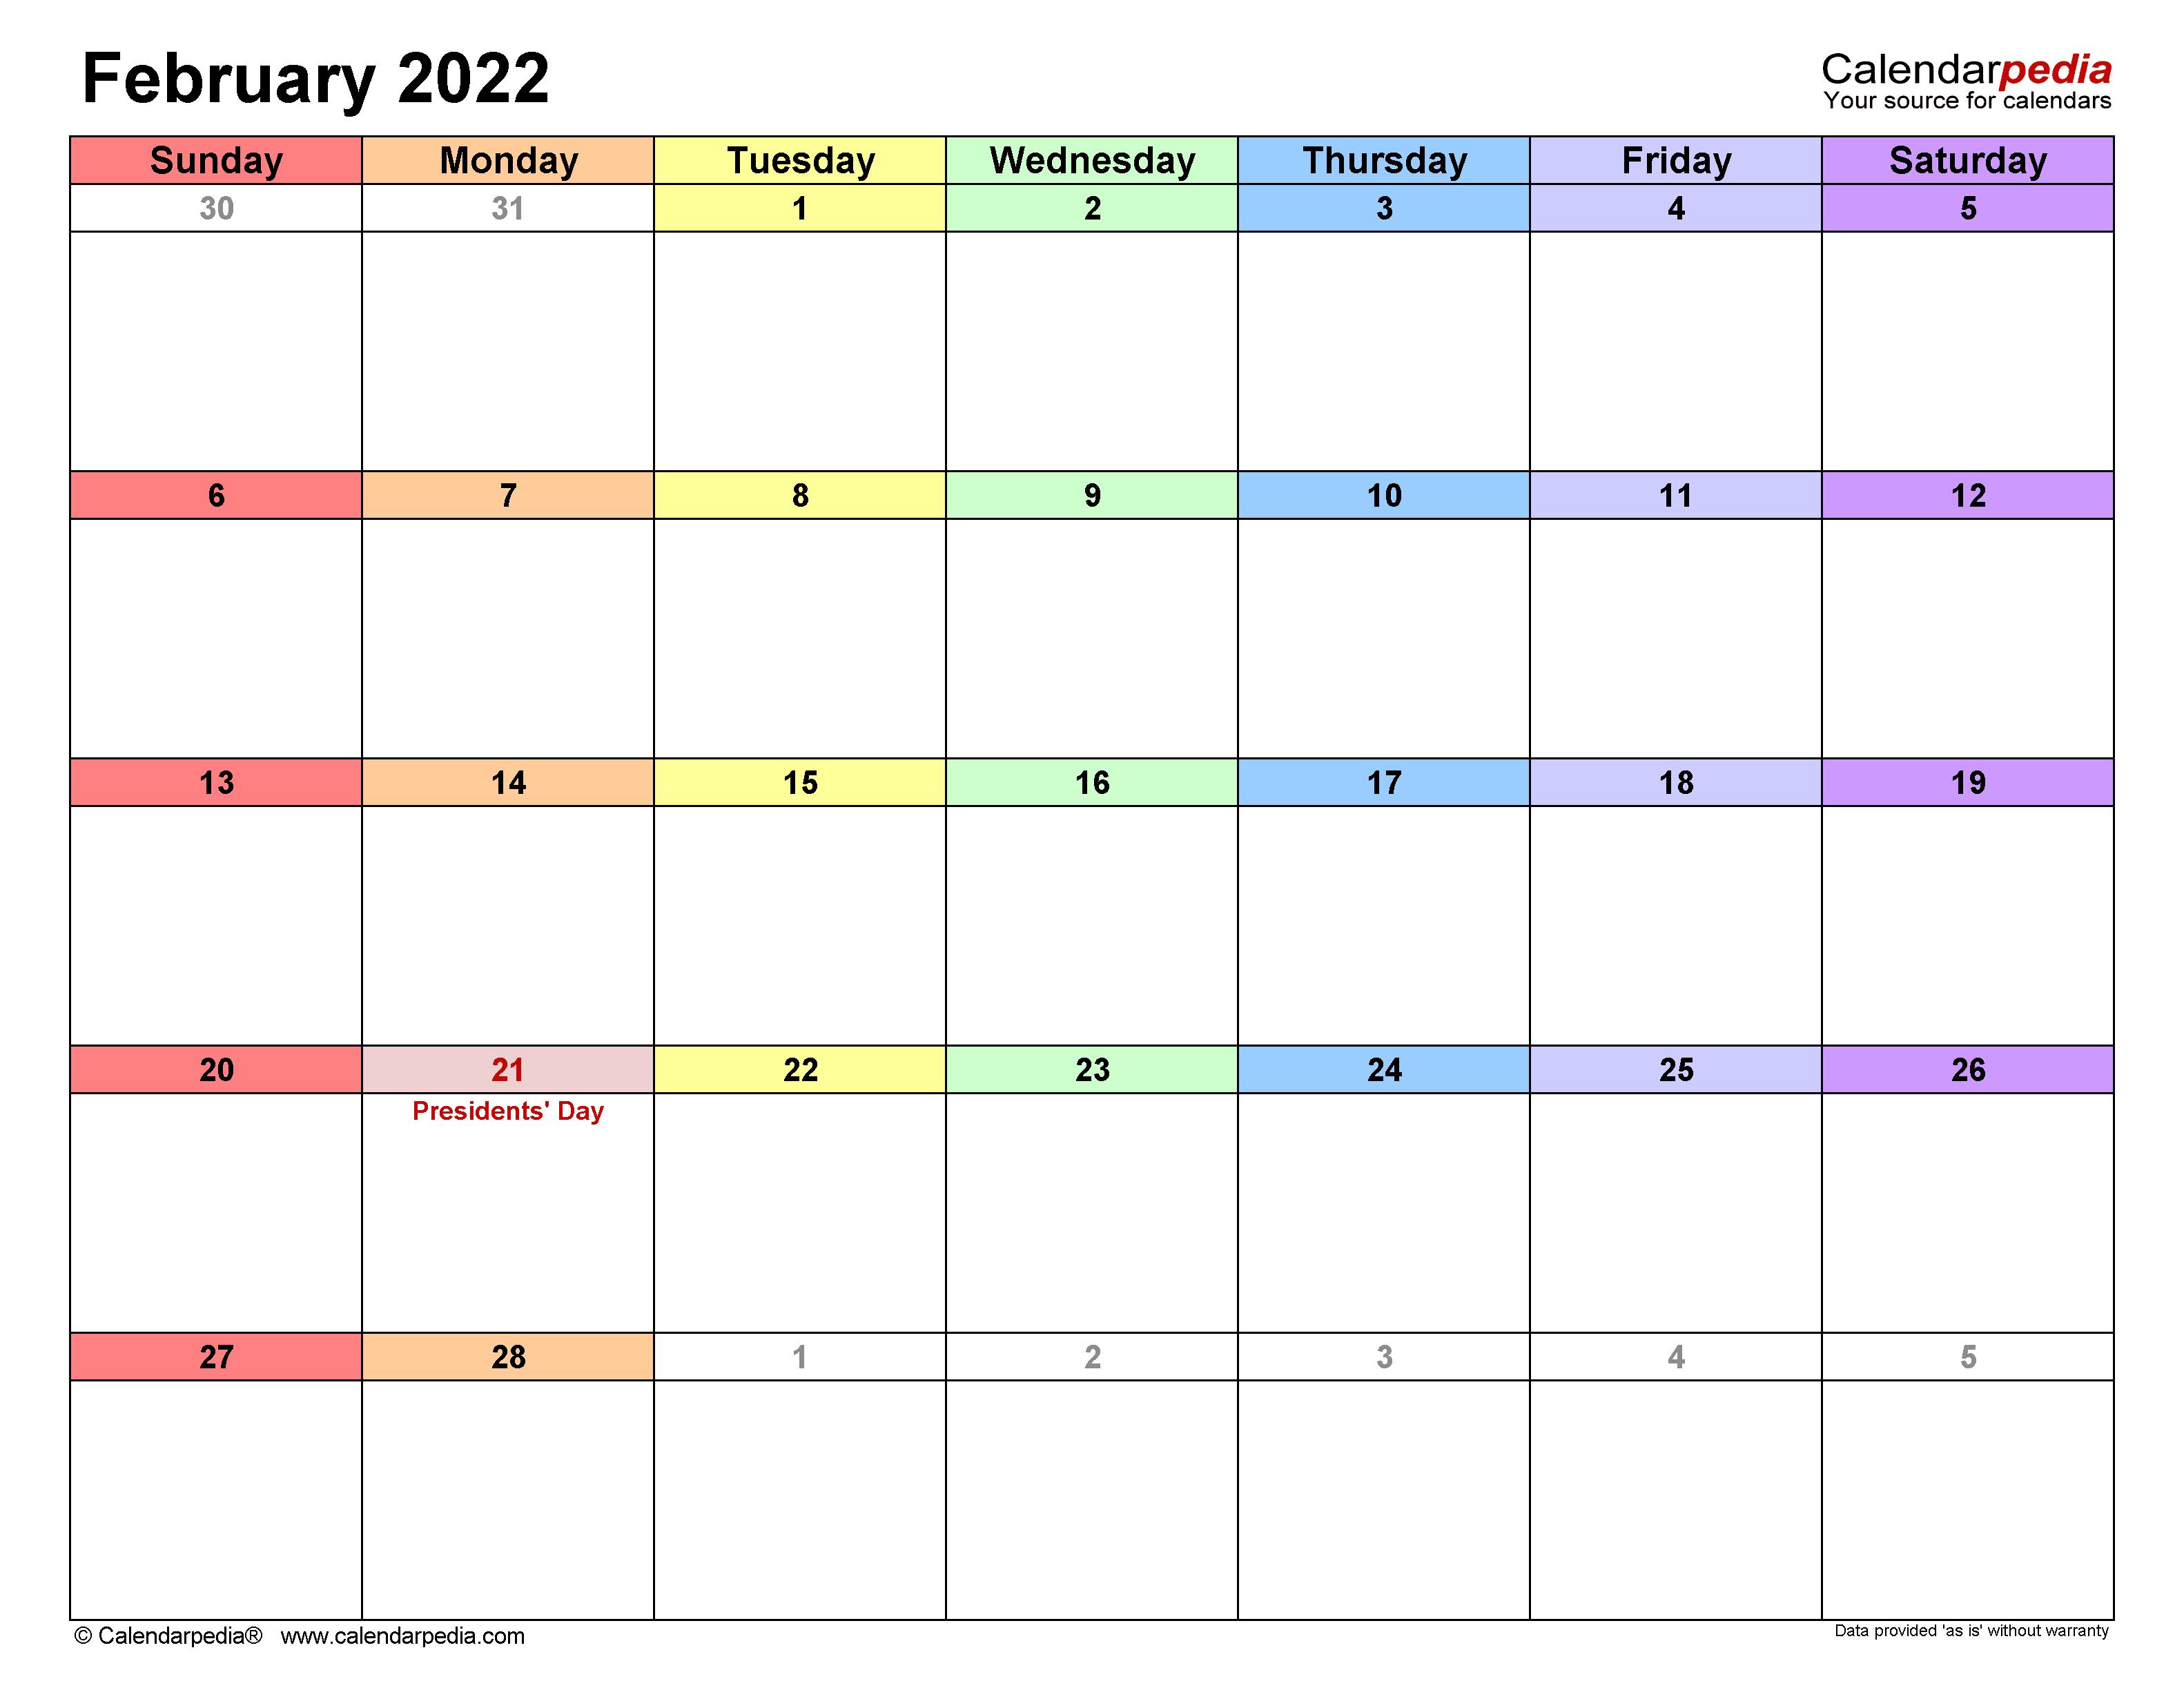 February 2022 Calendar   Templates For Word, Excel And Pdf Inside Free Printable Calendar For February 2022